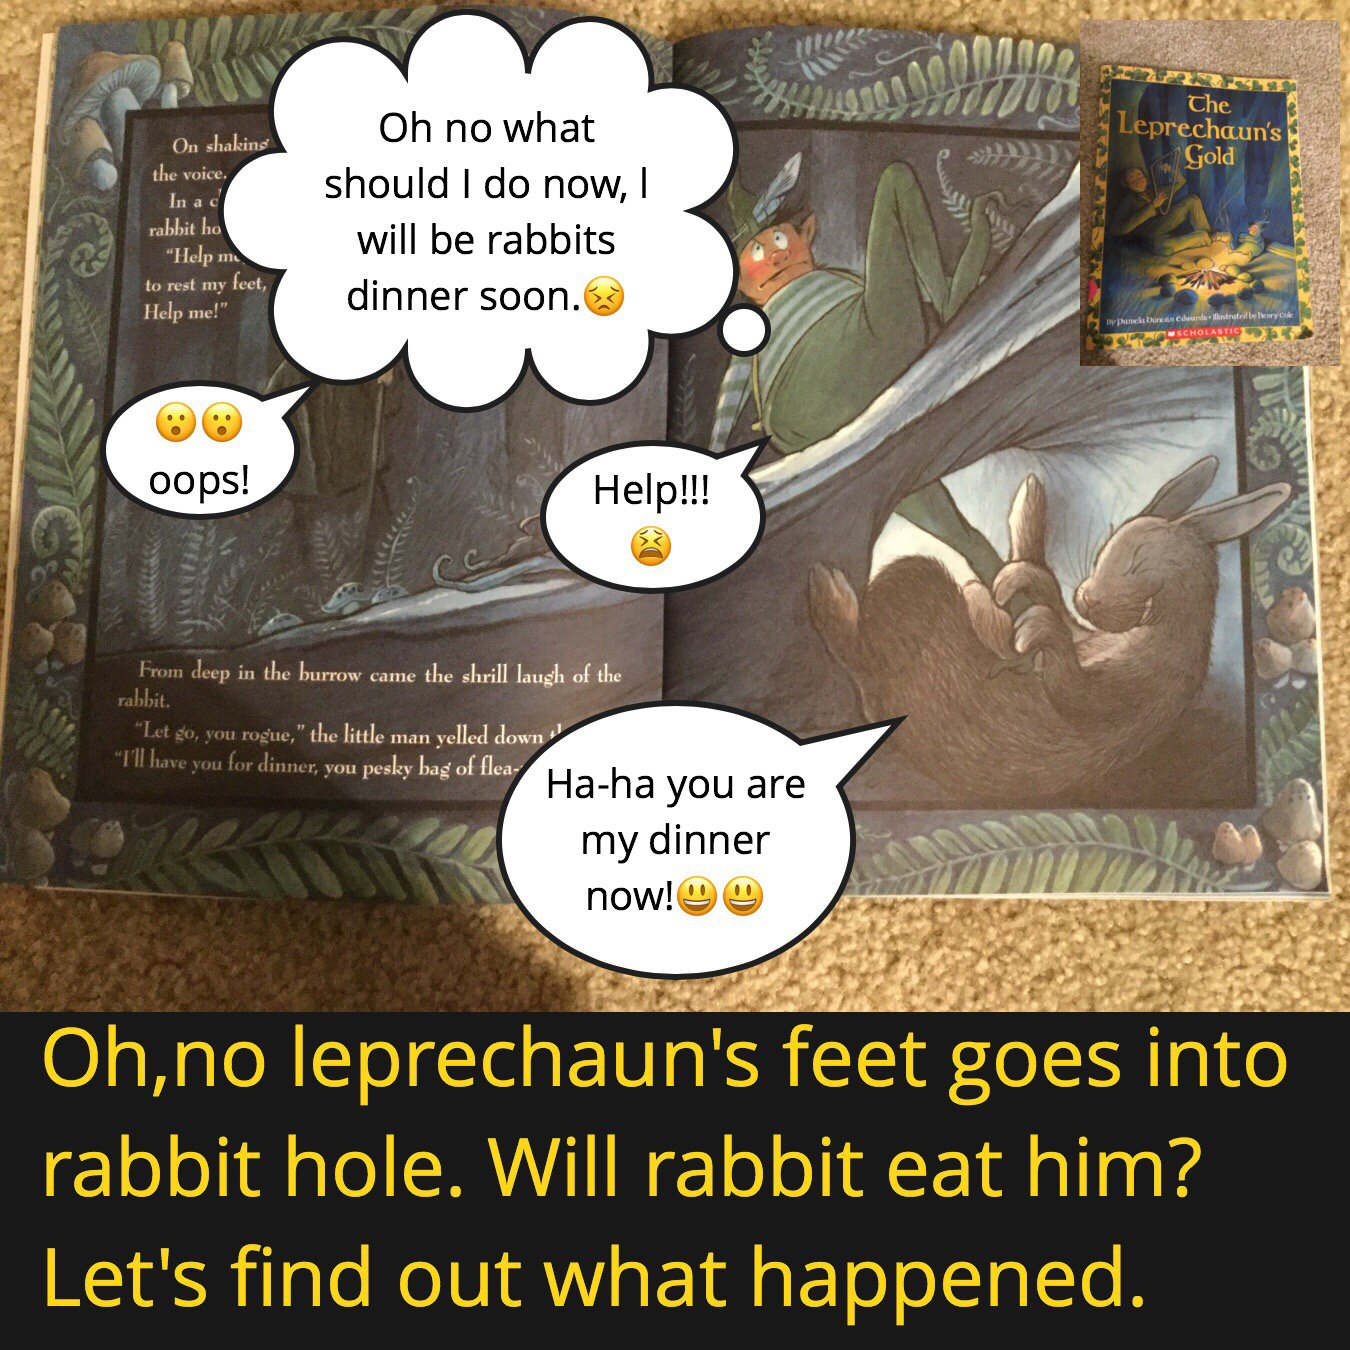 #booksnapswk2 #booksnaps MK_3S sharing The Leprechaun's Gold @BrookeBsulzmann #betl https://t.co/cHoovBb4KO